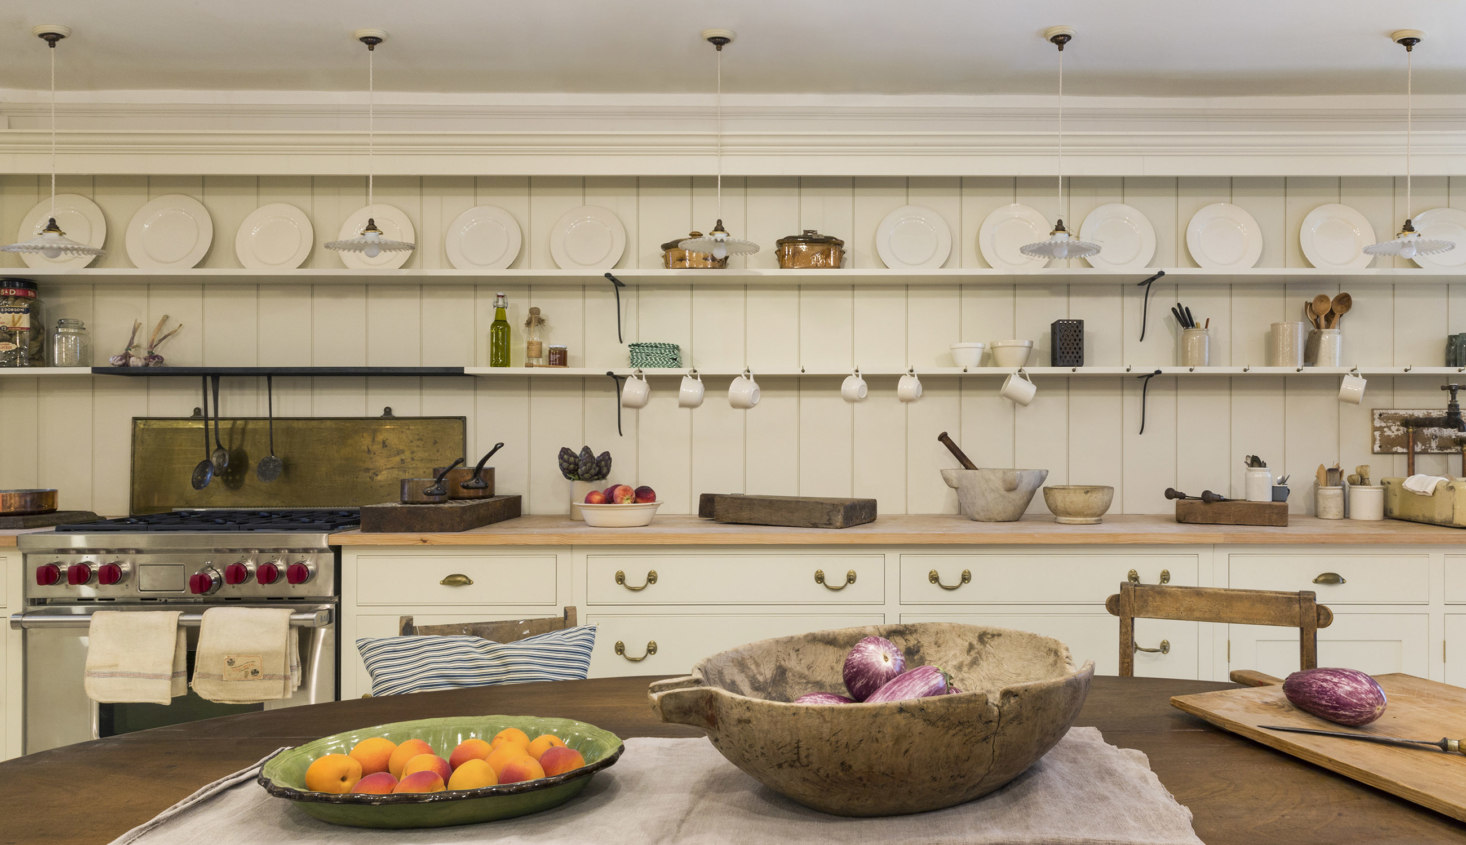 plain-english-kitchen-at-howe-london-photo-by-howe-10-1466x845.jpg